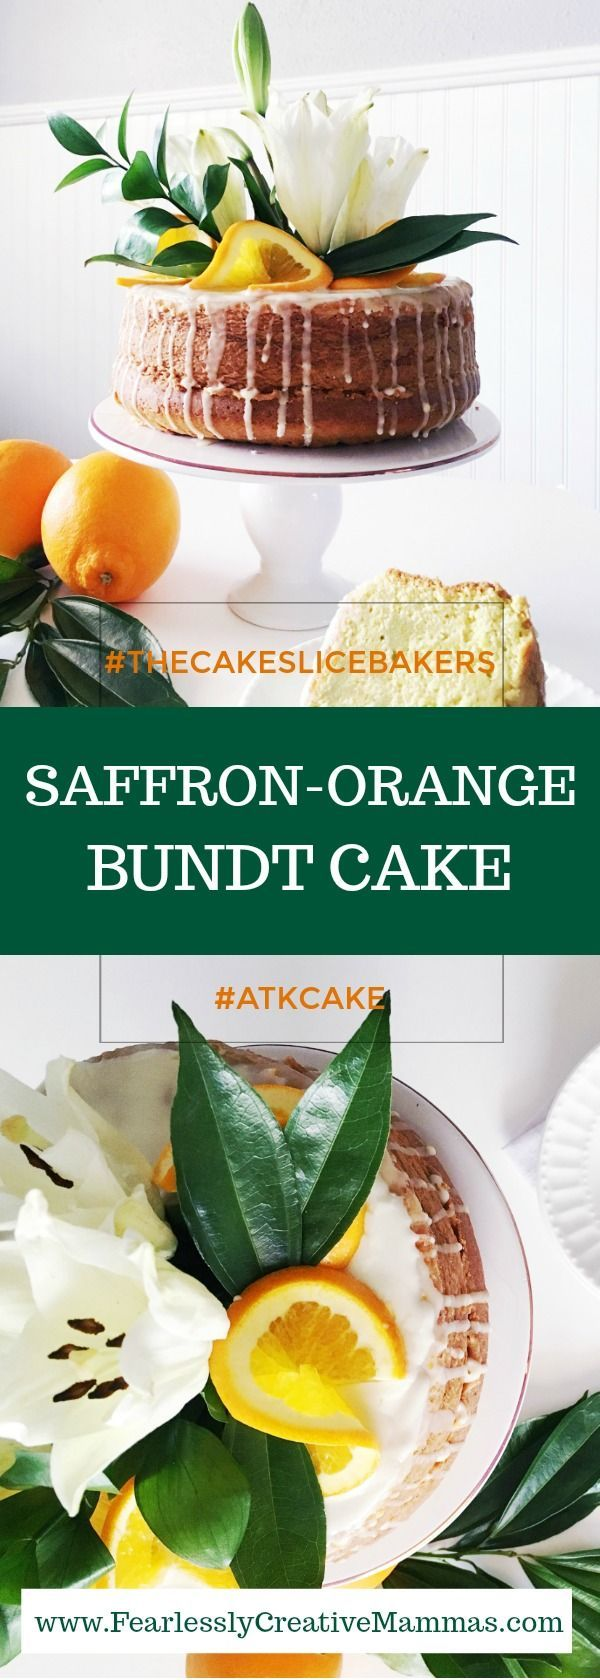 Saffron-Orange Bundt Cake: #TheCakeSliceBakers #ATKcake